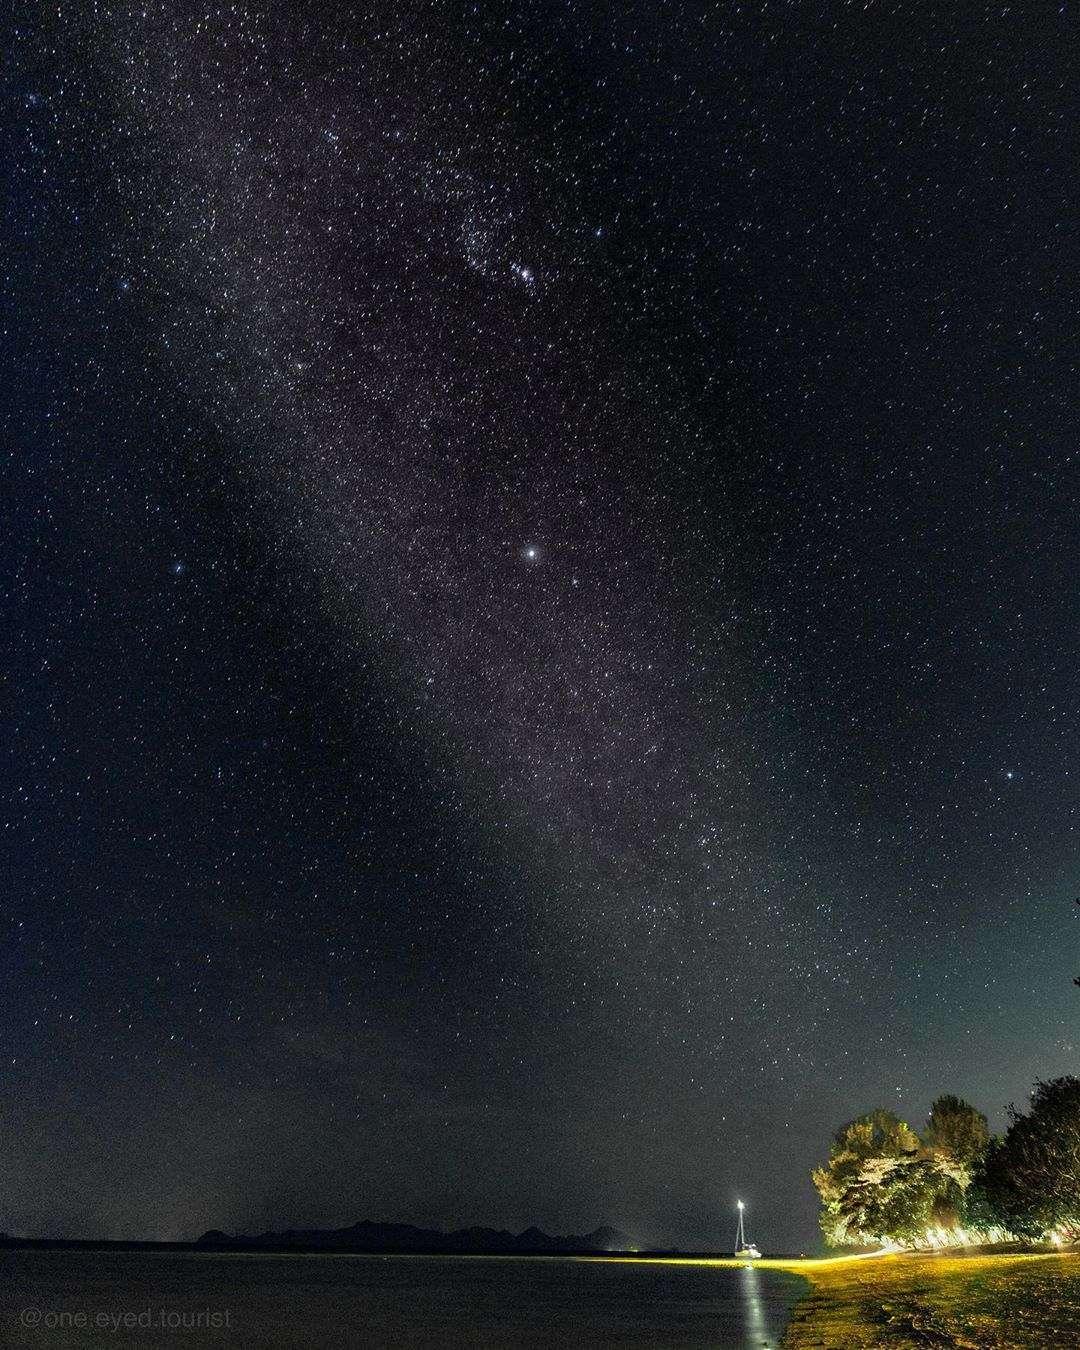 Starry sky seen from Koh Kradan in Thailand